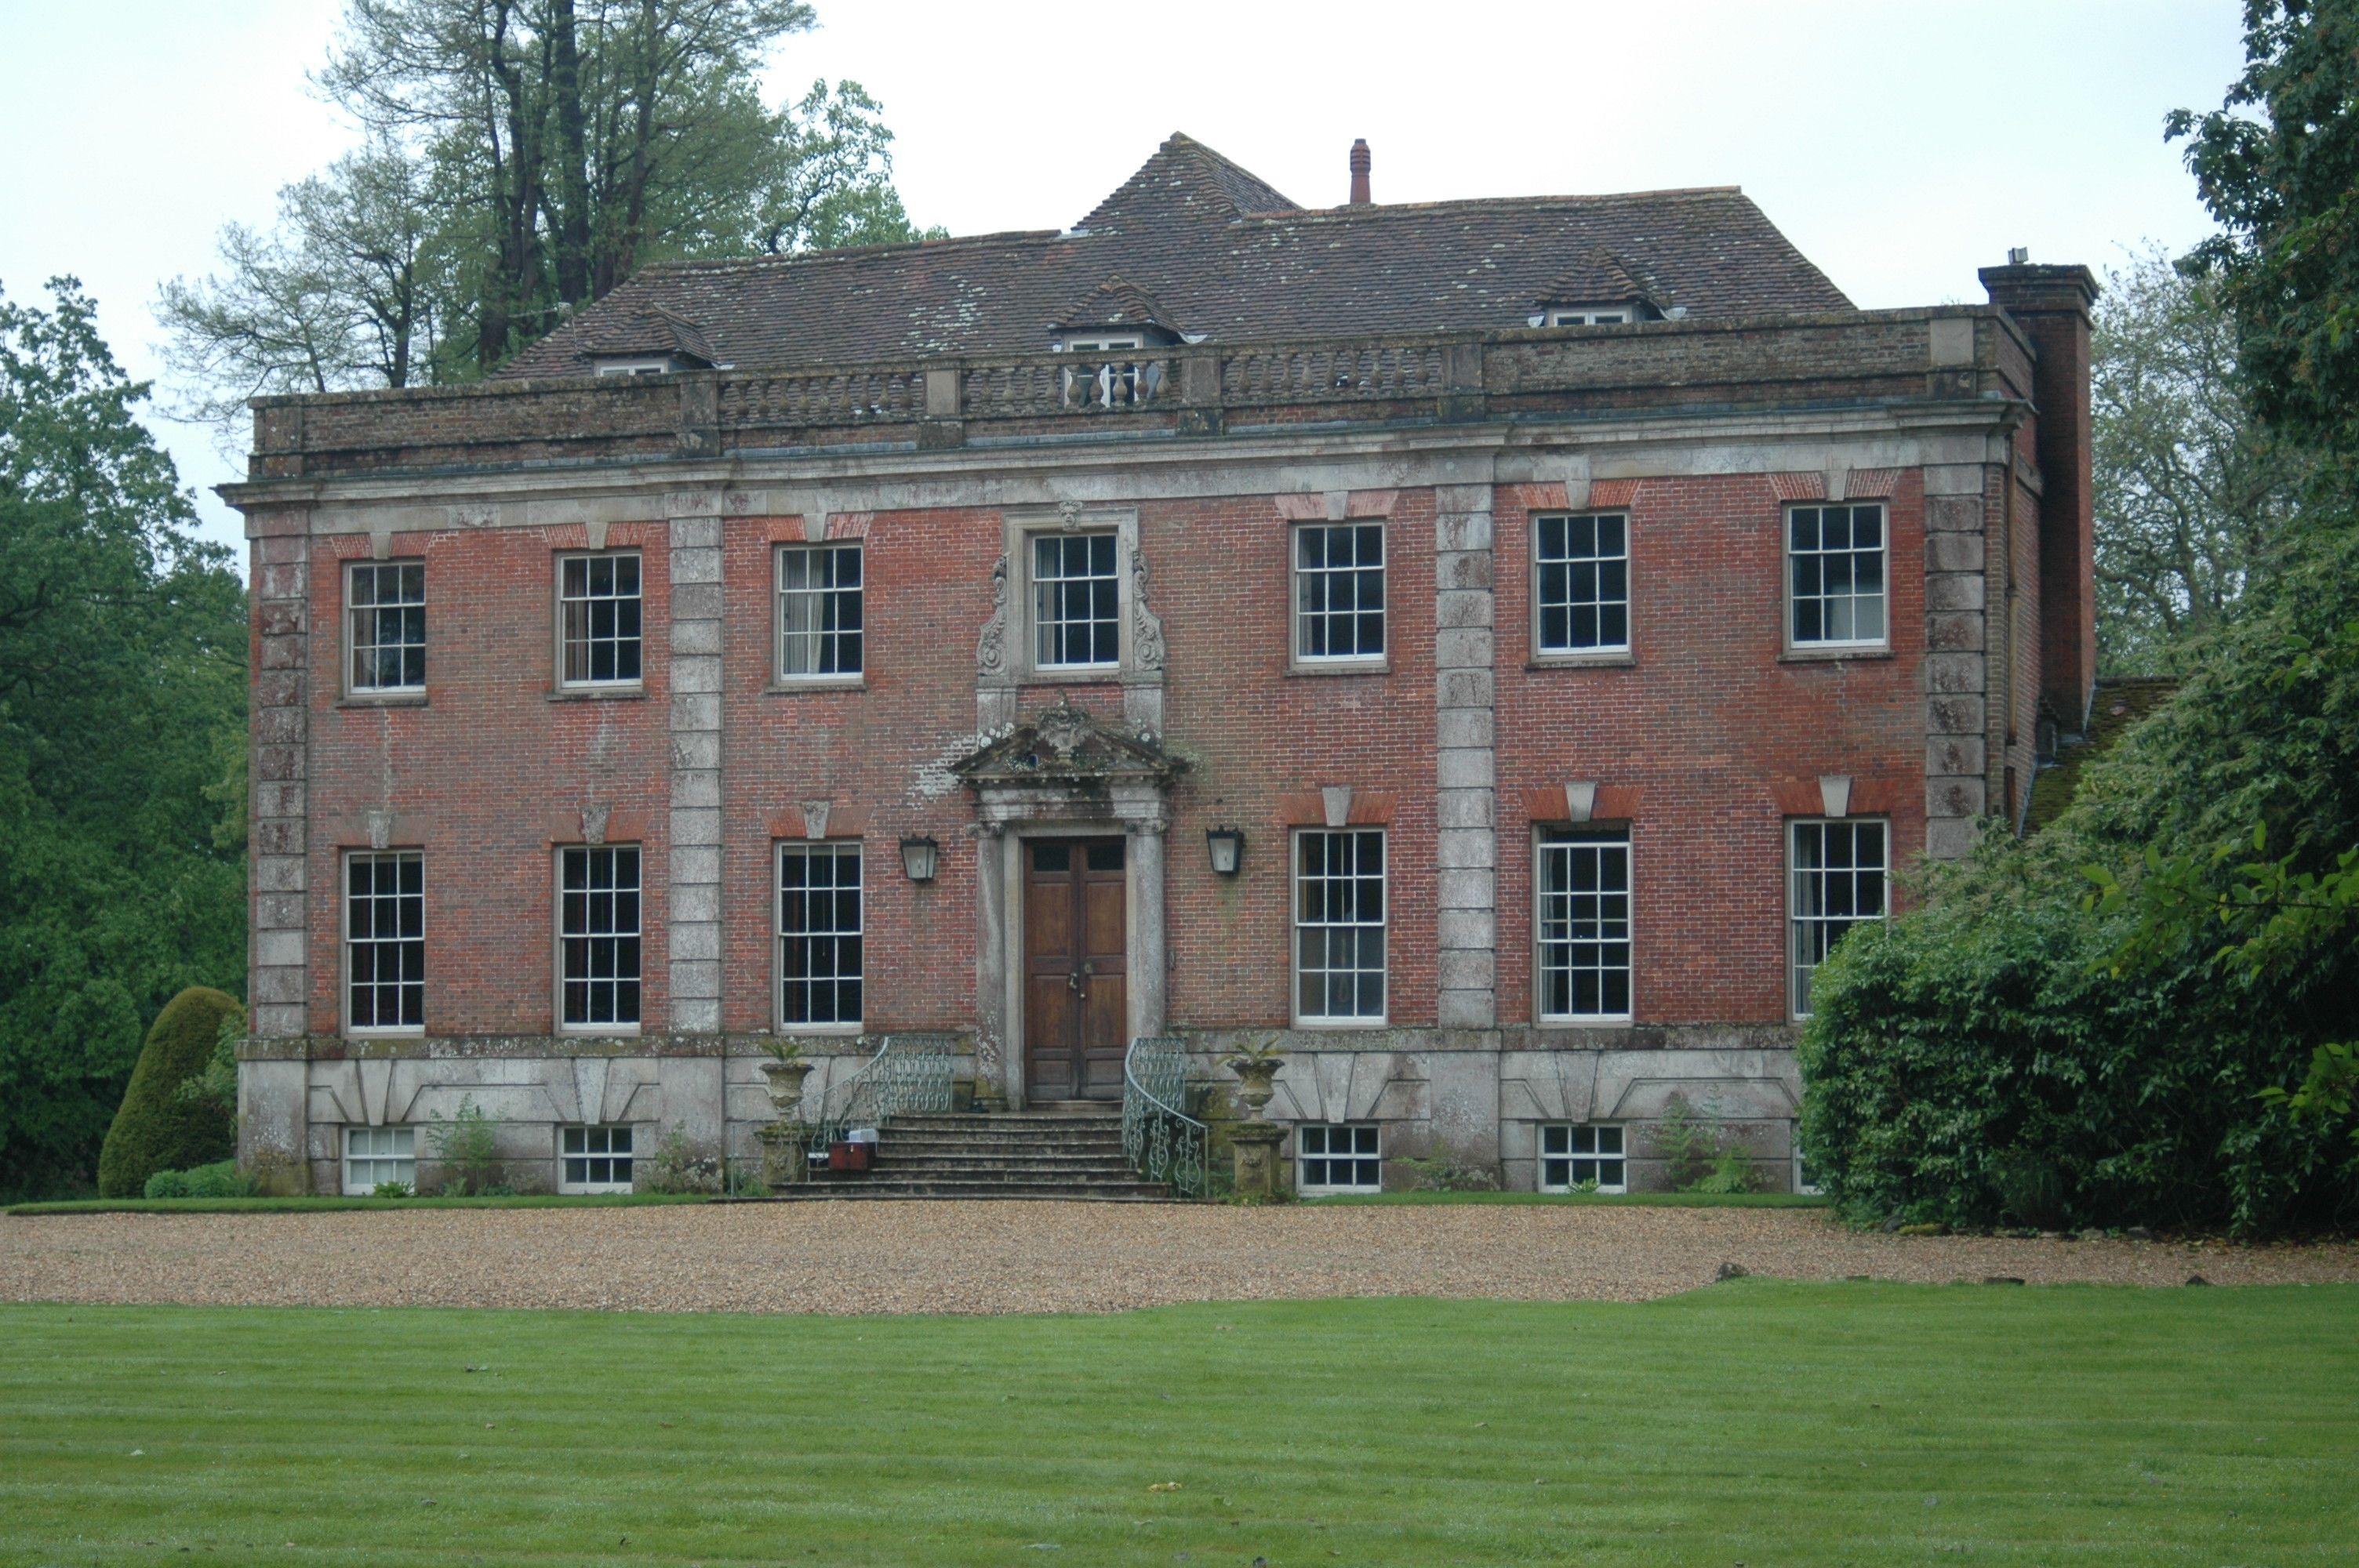 Deans Court, Wimbourne, Dorset